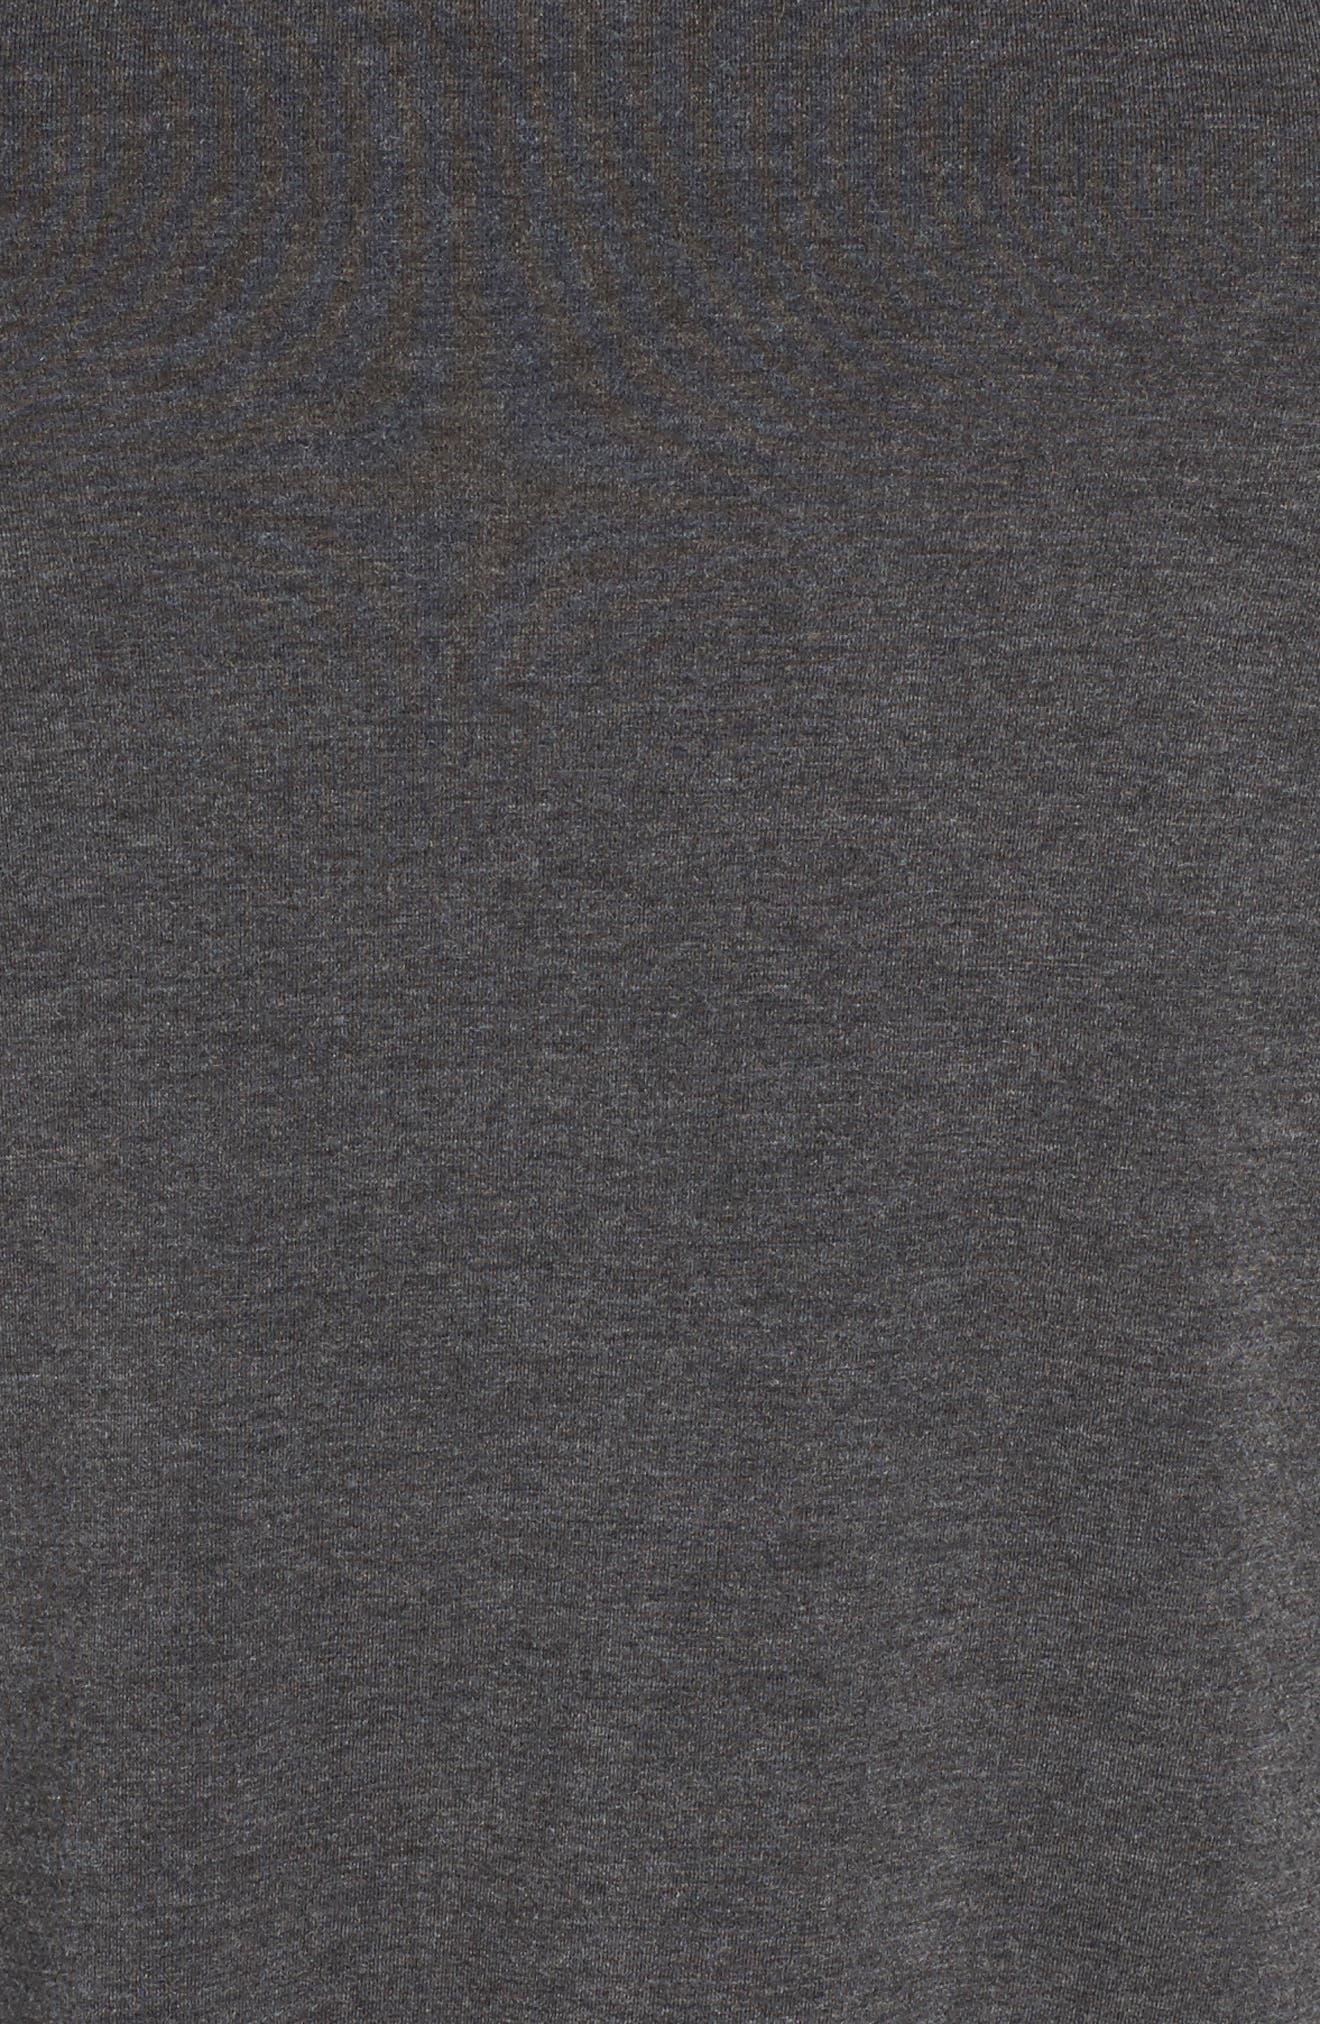 Long Sleeve Raglan Swing Tee,                             Alternate thumbnail 5, color,                             Grey Dark Charcoal Heather